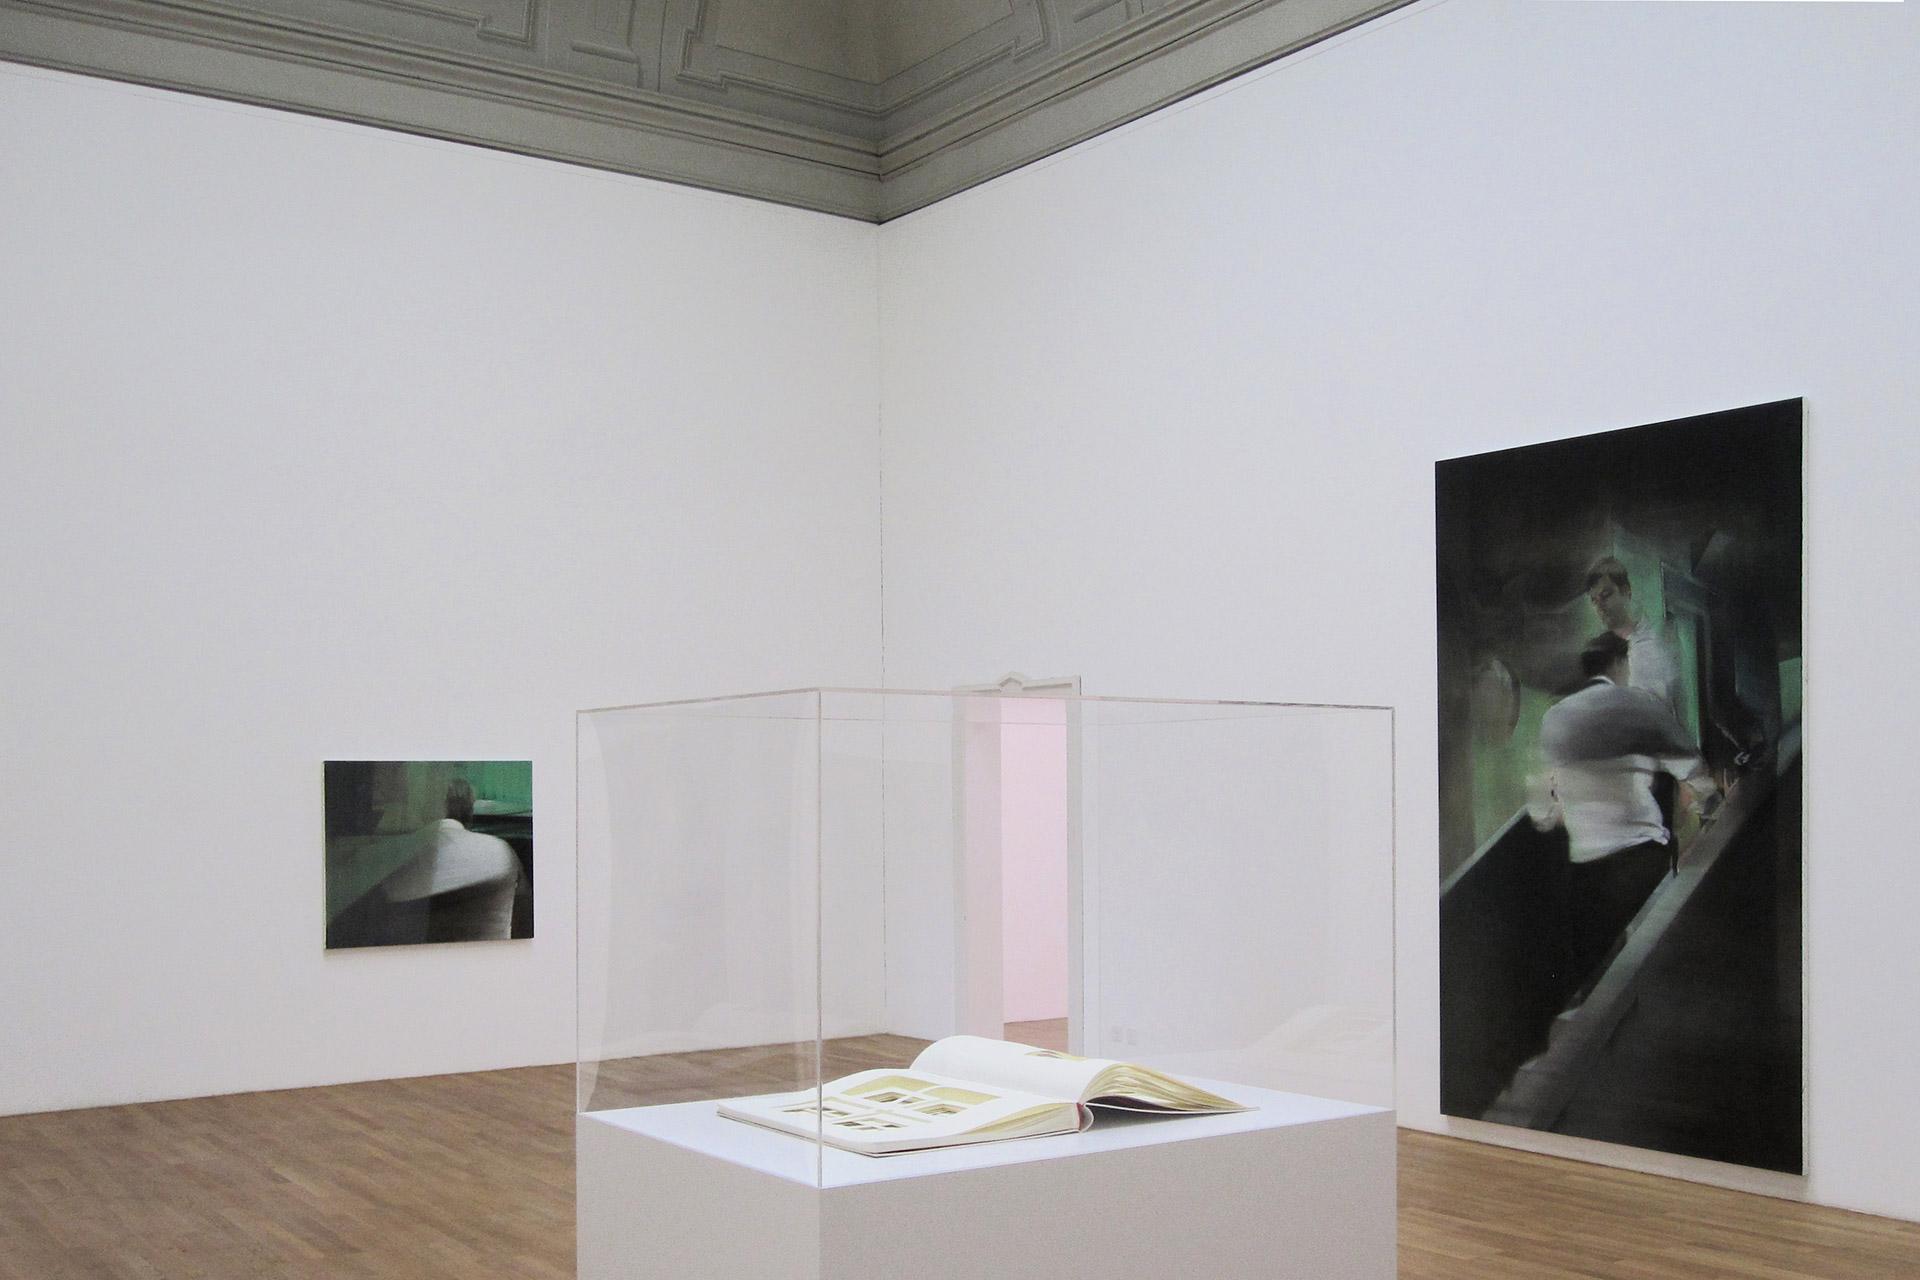 Vera-Ida-Mueller-Kunsthalle-Winterthur-2011.jpg